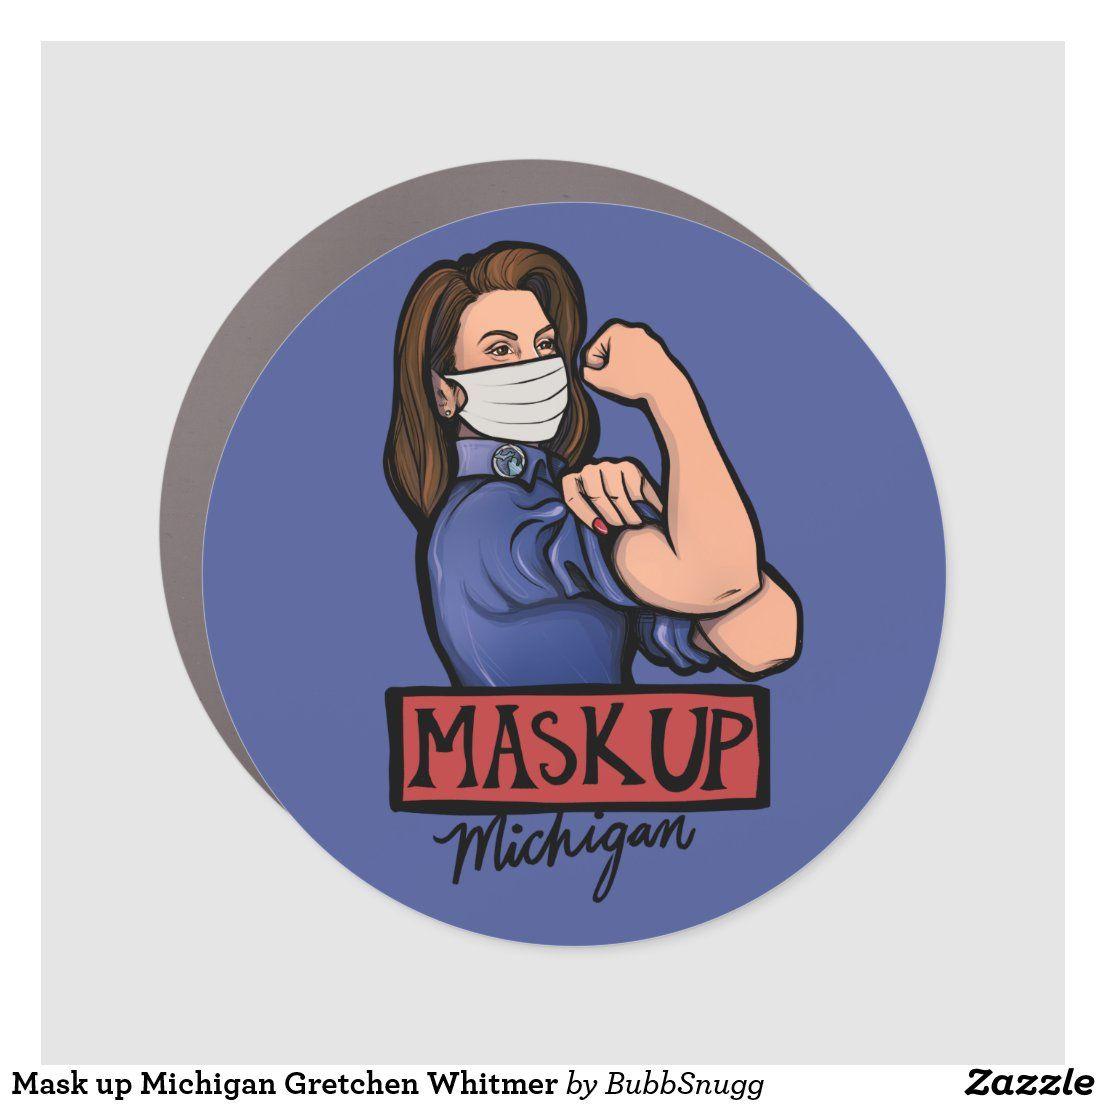 Mask Up Michigan Gretchen Whitmer Car Magnet Zazzle Com In 2021 Car Magnets Mask Bumper Stickers [ 1106 x 1106 Pixel ]